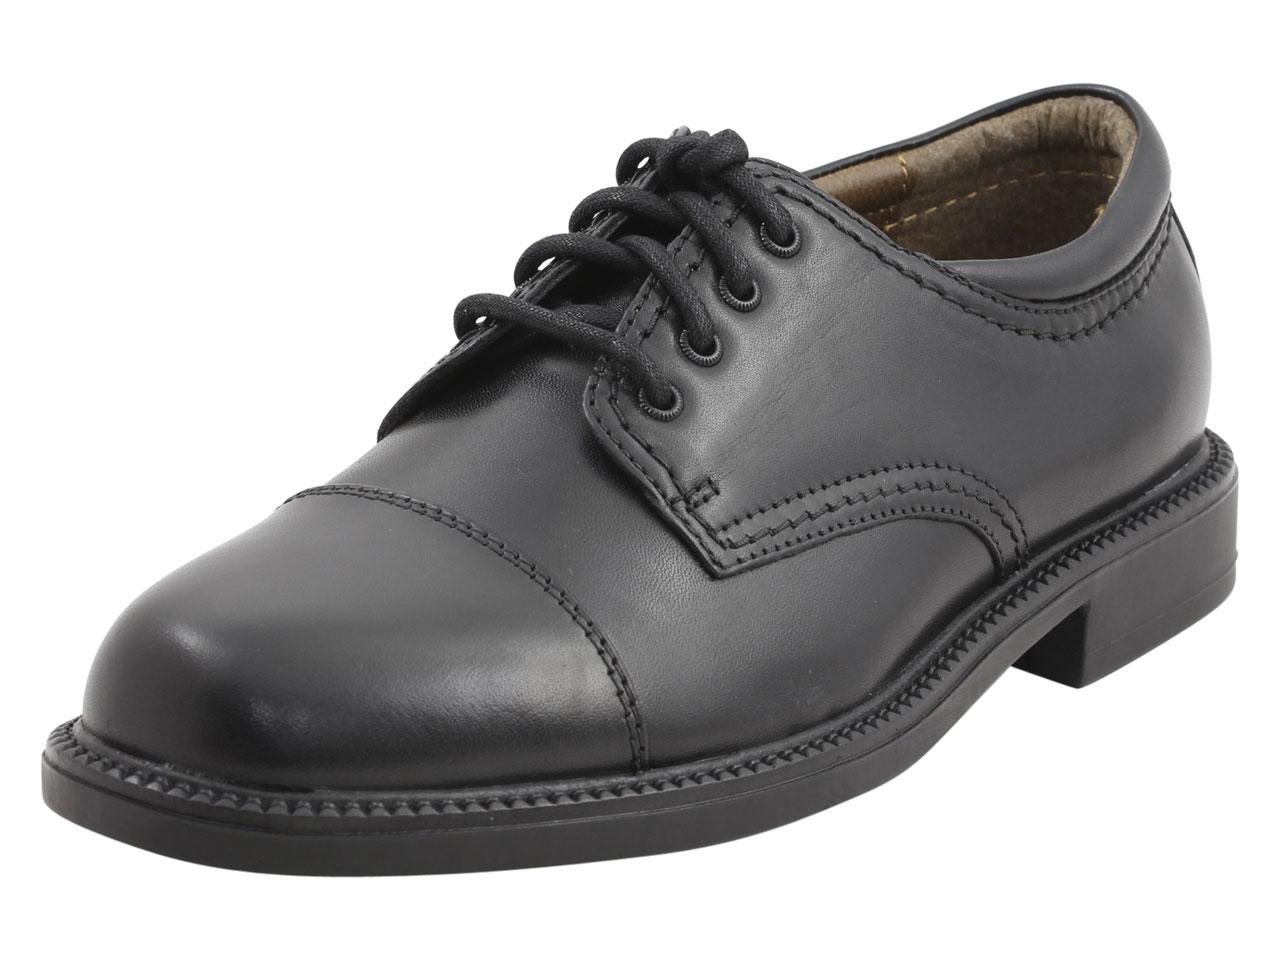 Image of Dockers Men's Gordon Cap Toe Oxfords Shoes - Black - 14 E(W) US